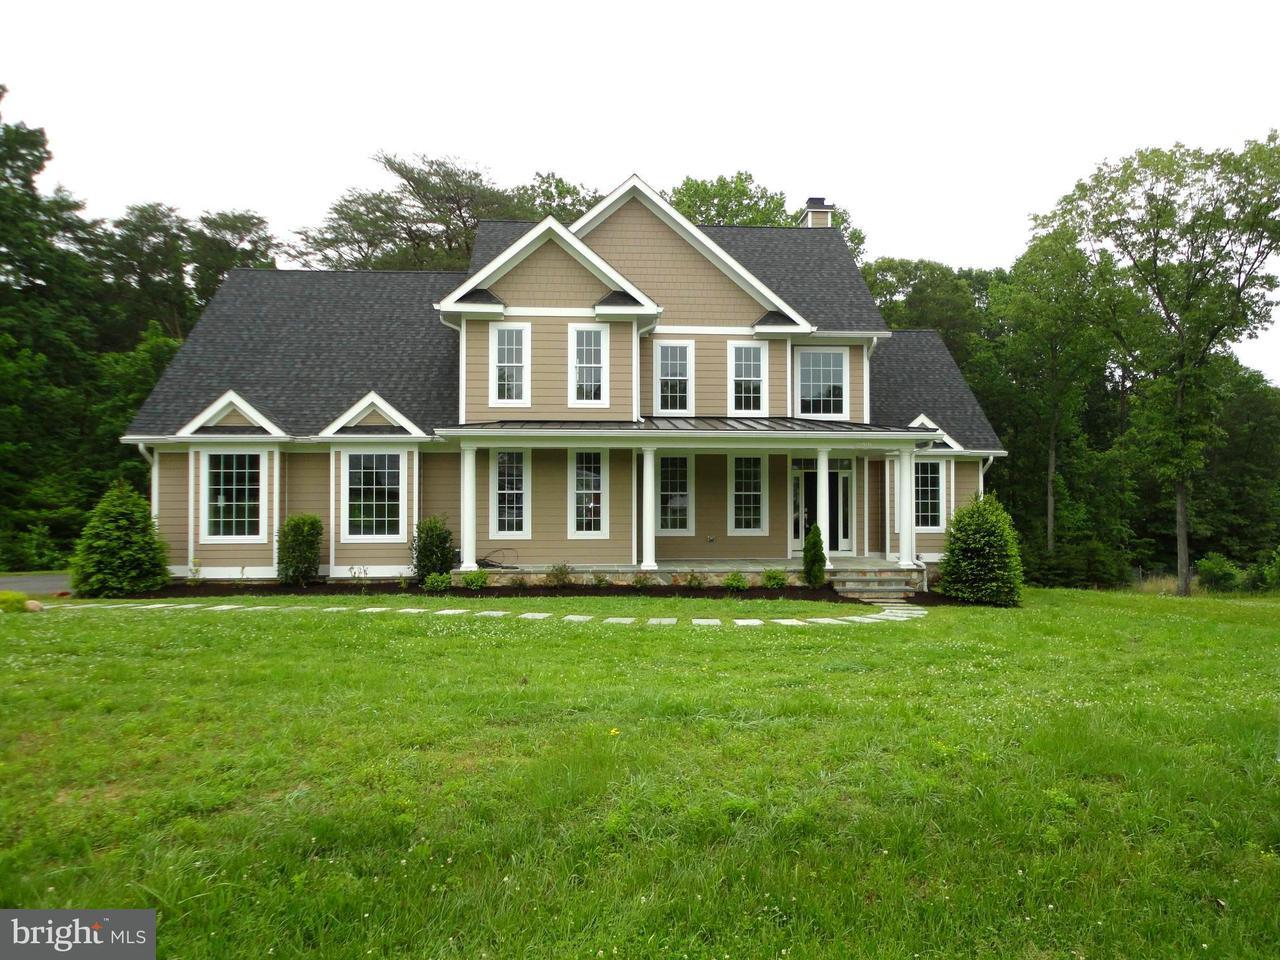 Casa Unifamiliar por un Venta en 1008 SAINT ANNE Lane 1008 SAINT ANNE Lane Millersville, Maryland 21108 Estados Unidos